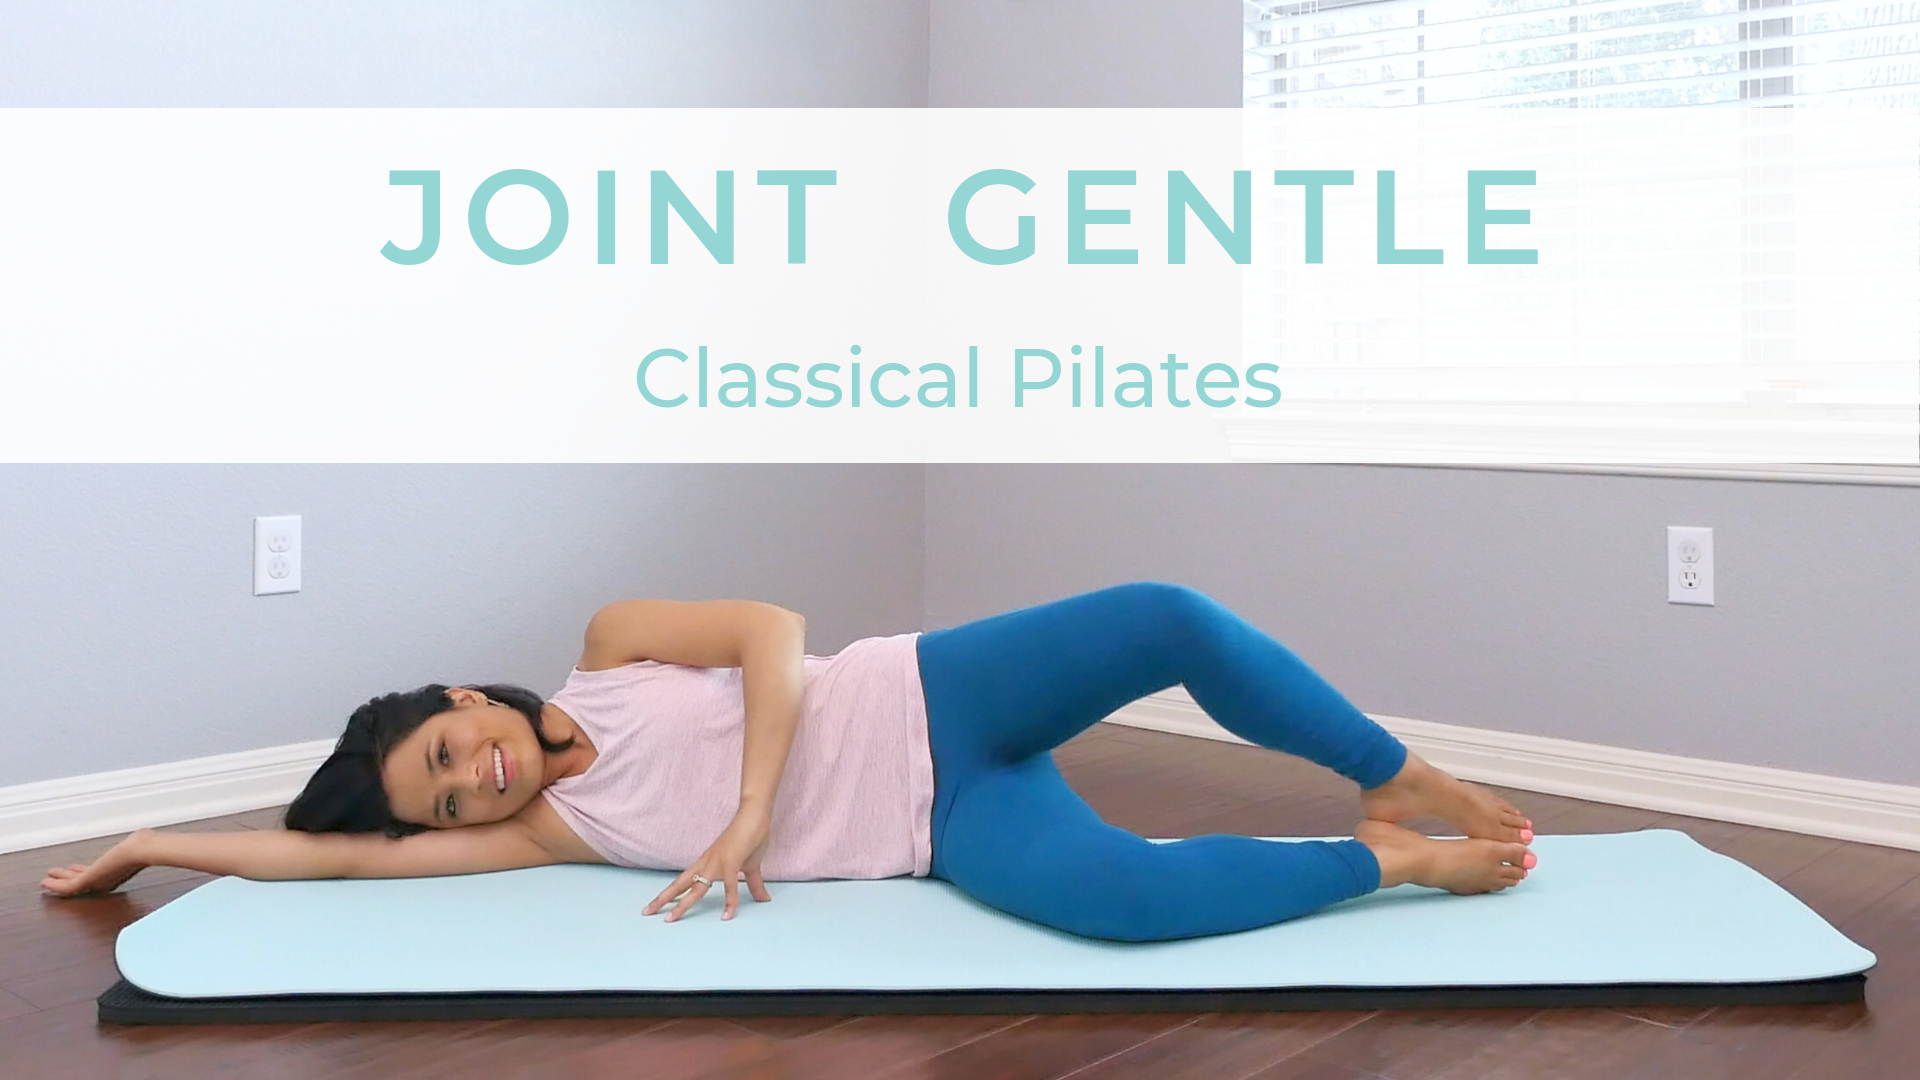 Joint+Gentle+Classical+Pilates  - Pilates Nest.png